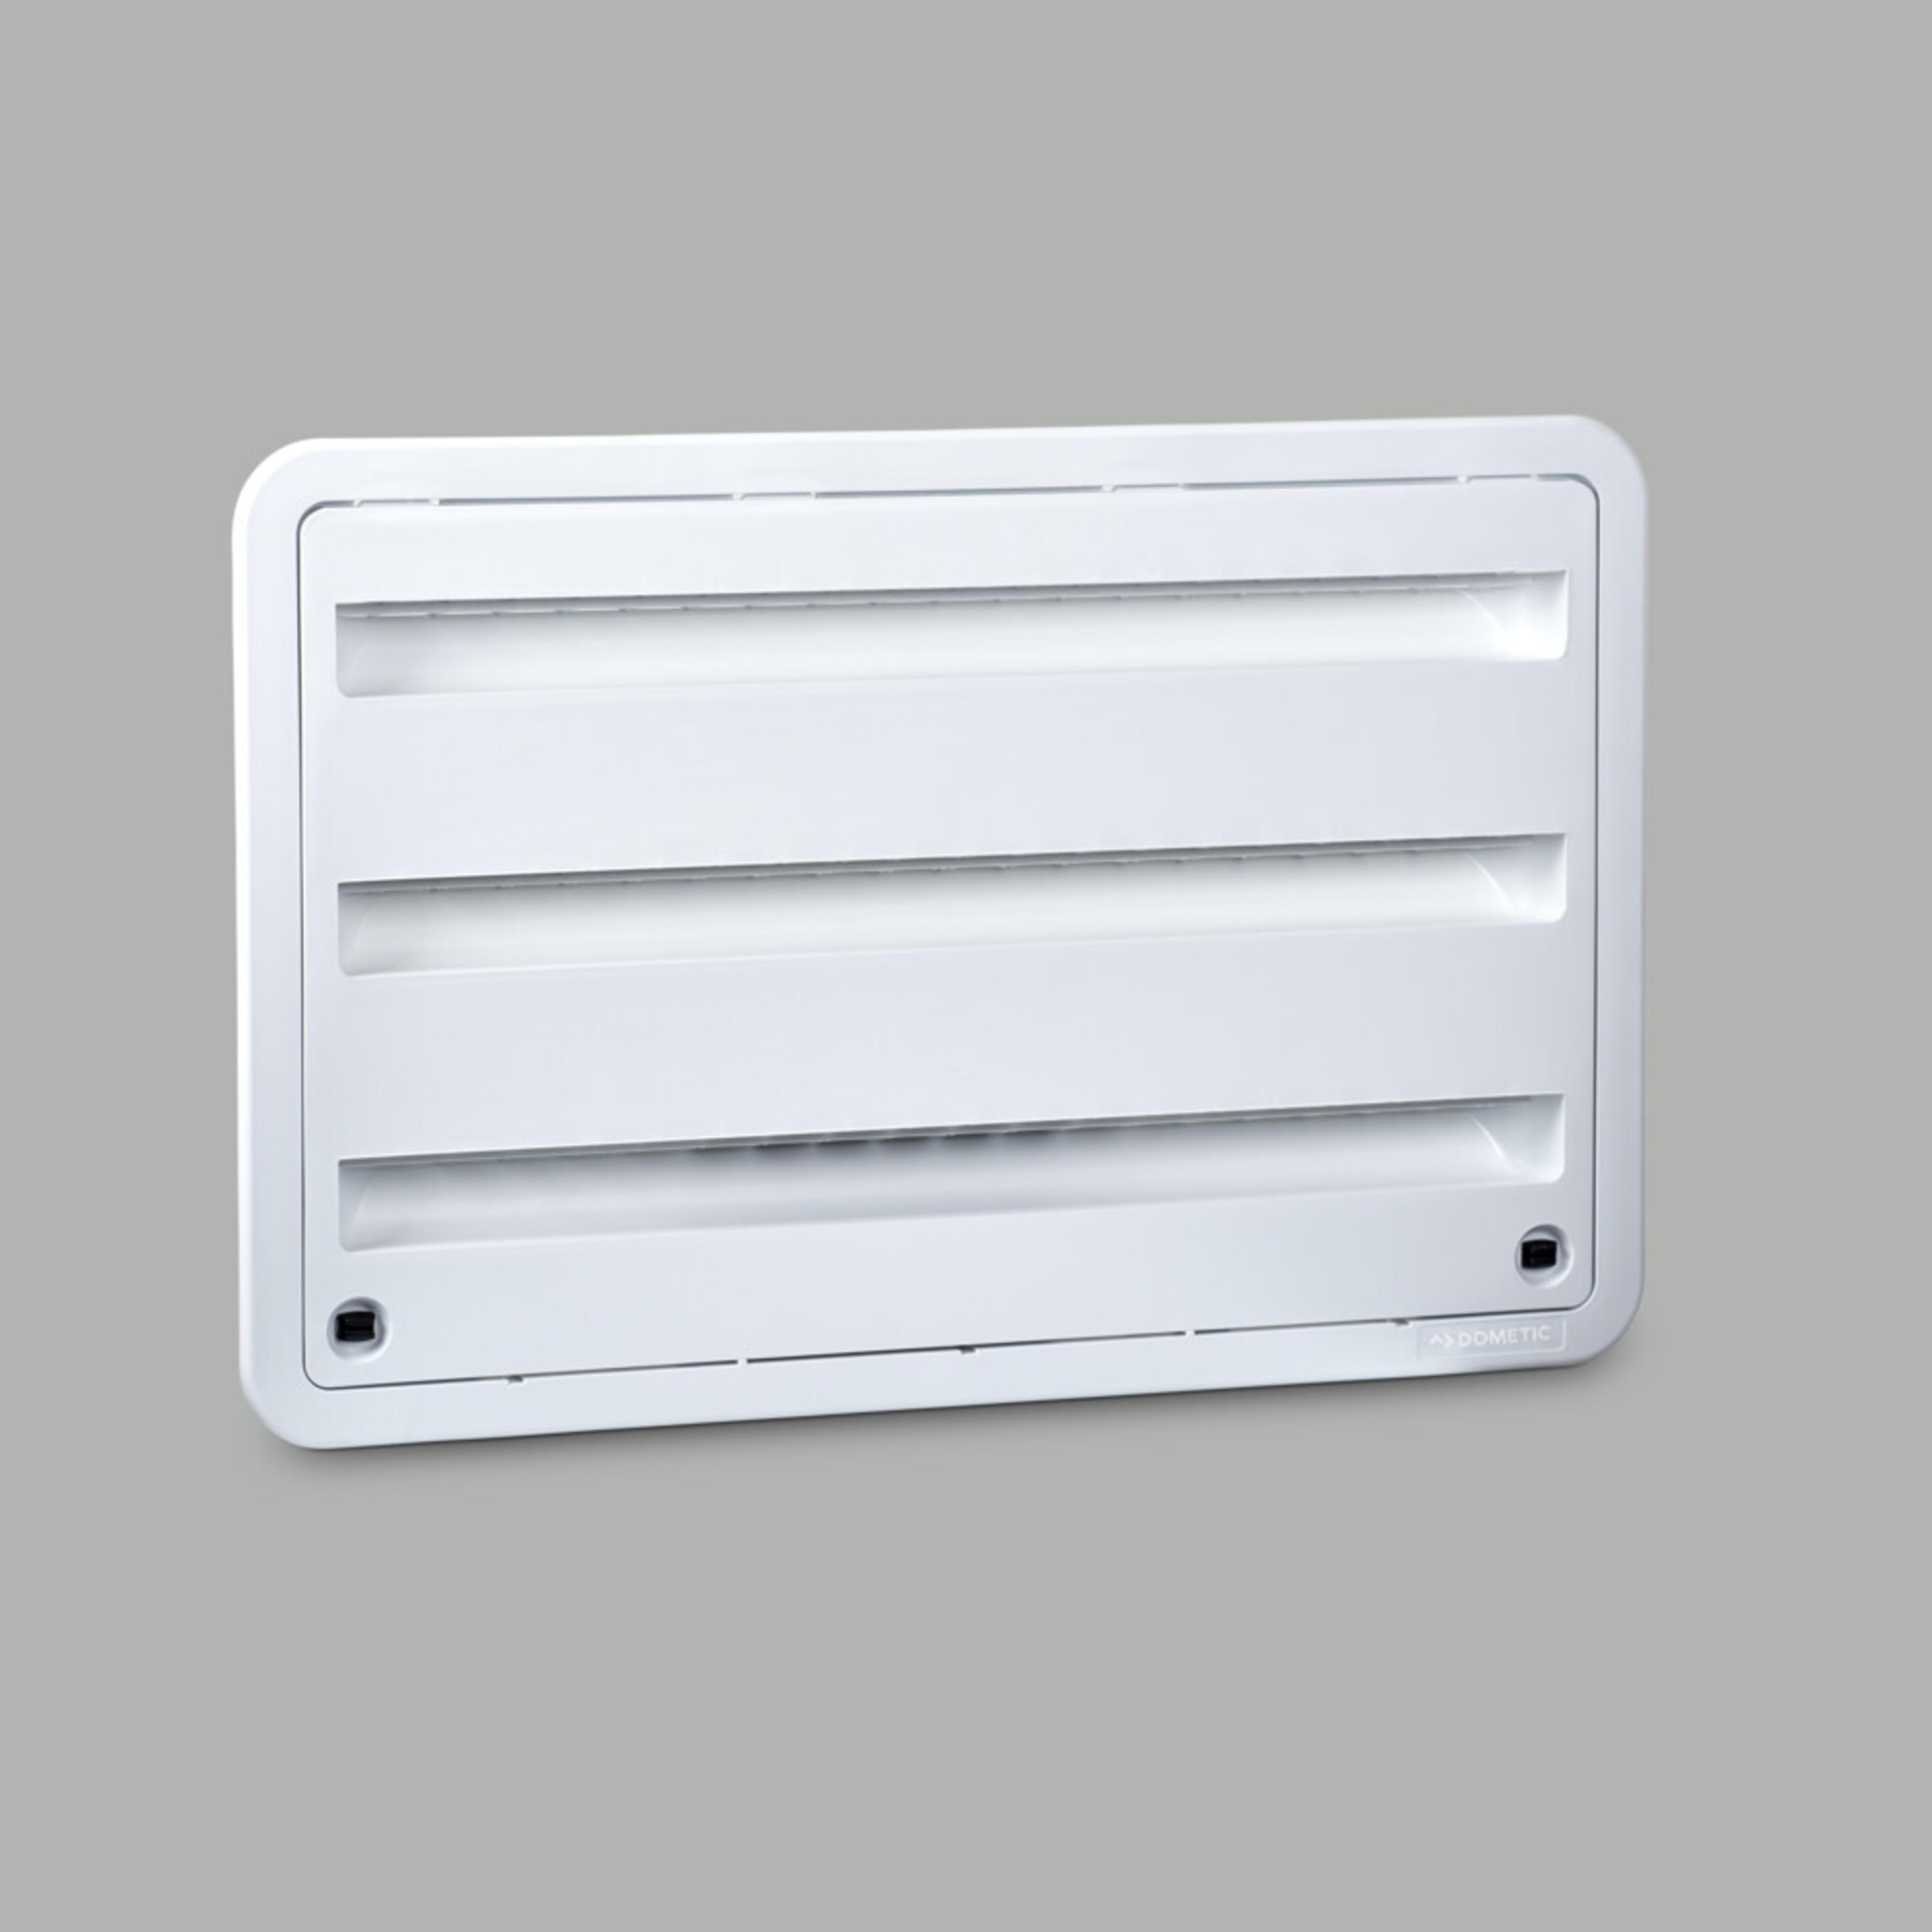 Dometic Refrigerator Vent